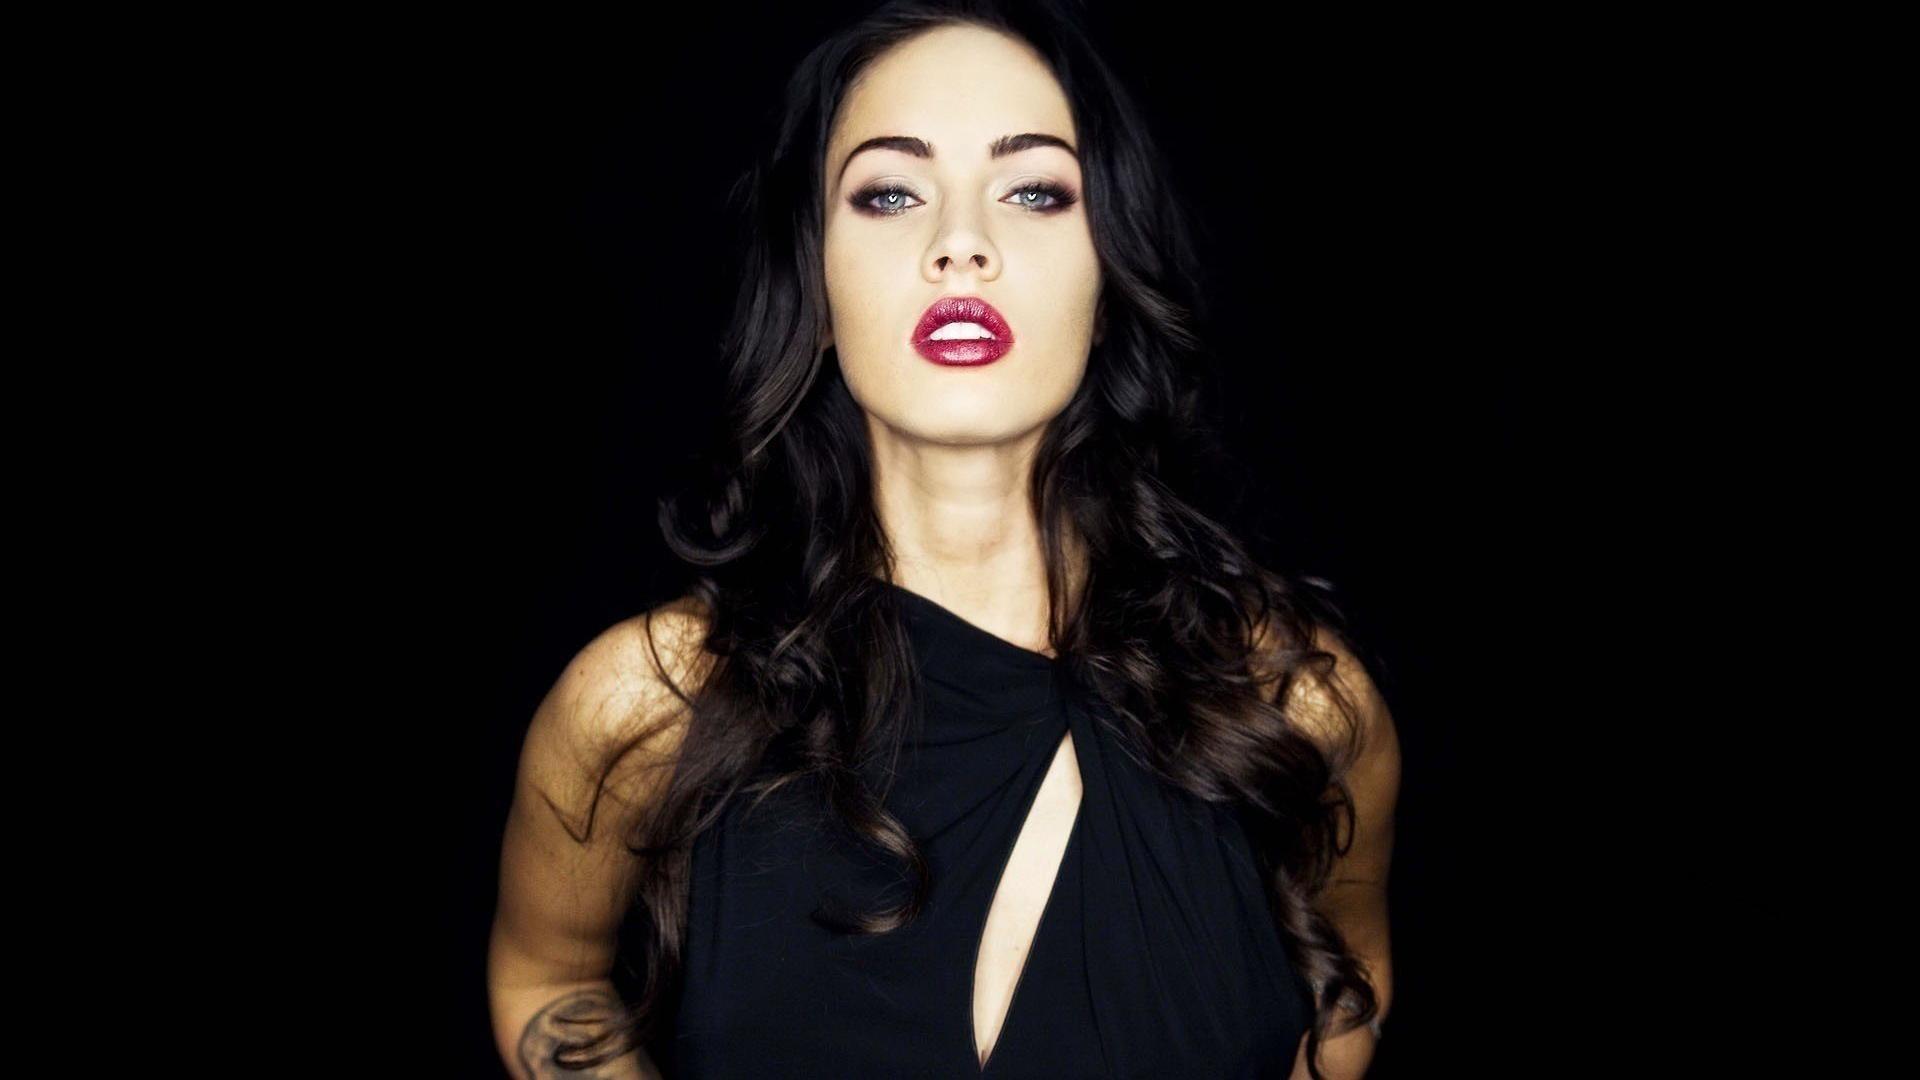 Megan Fox Hot Girl HD Wallpaper